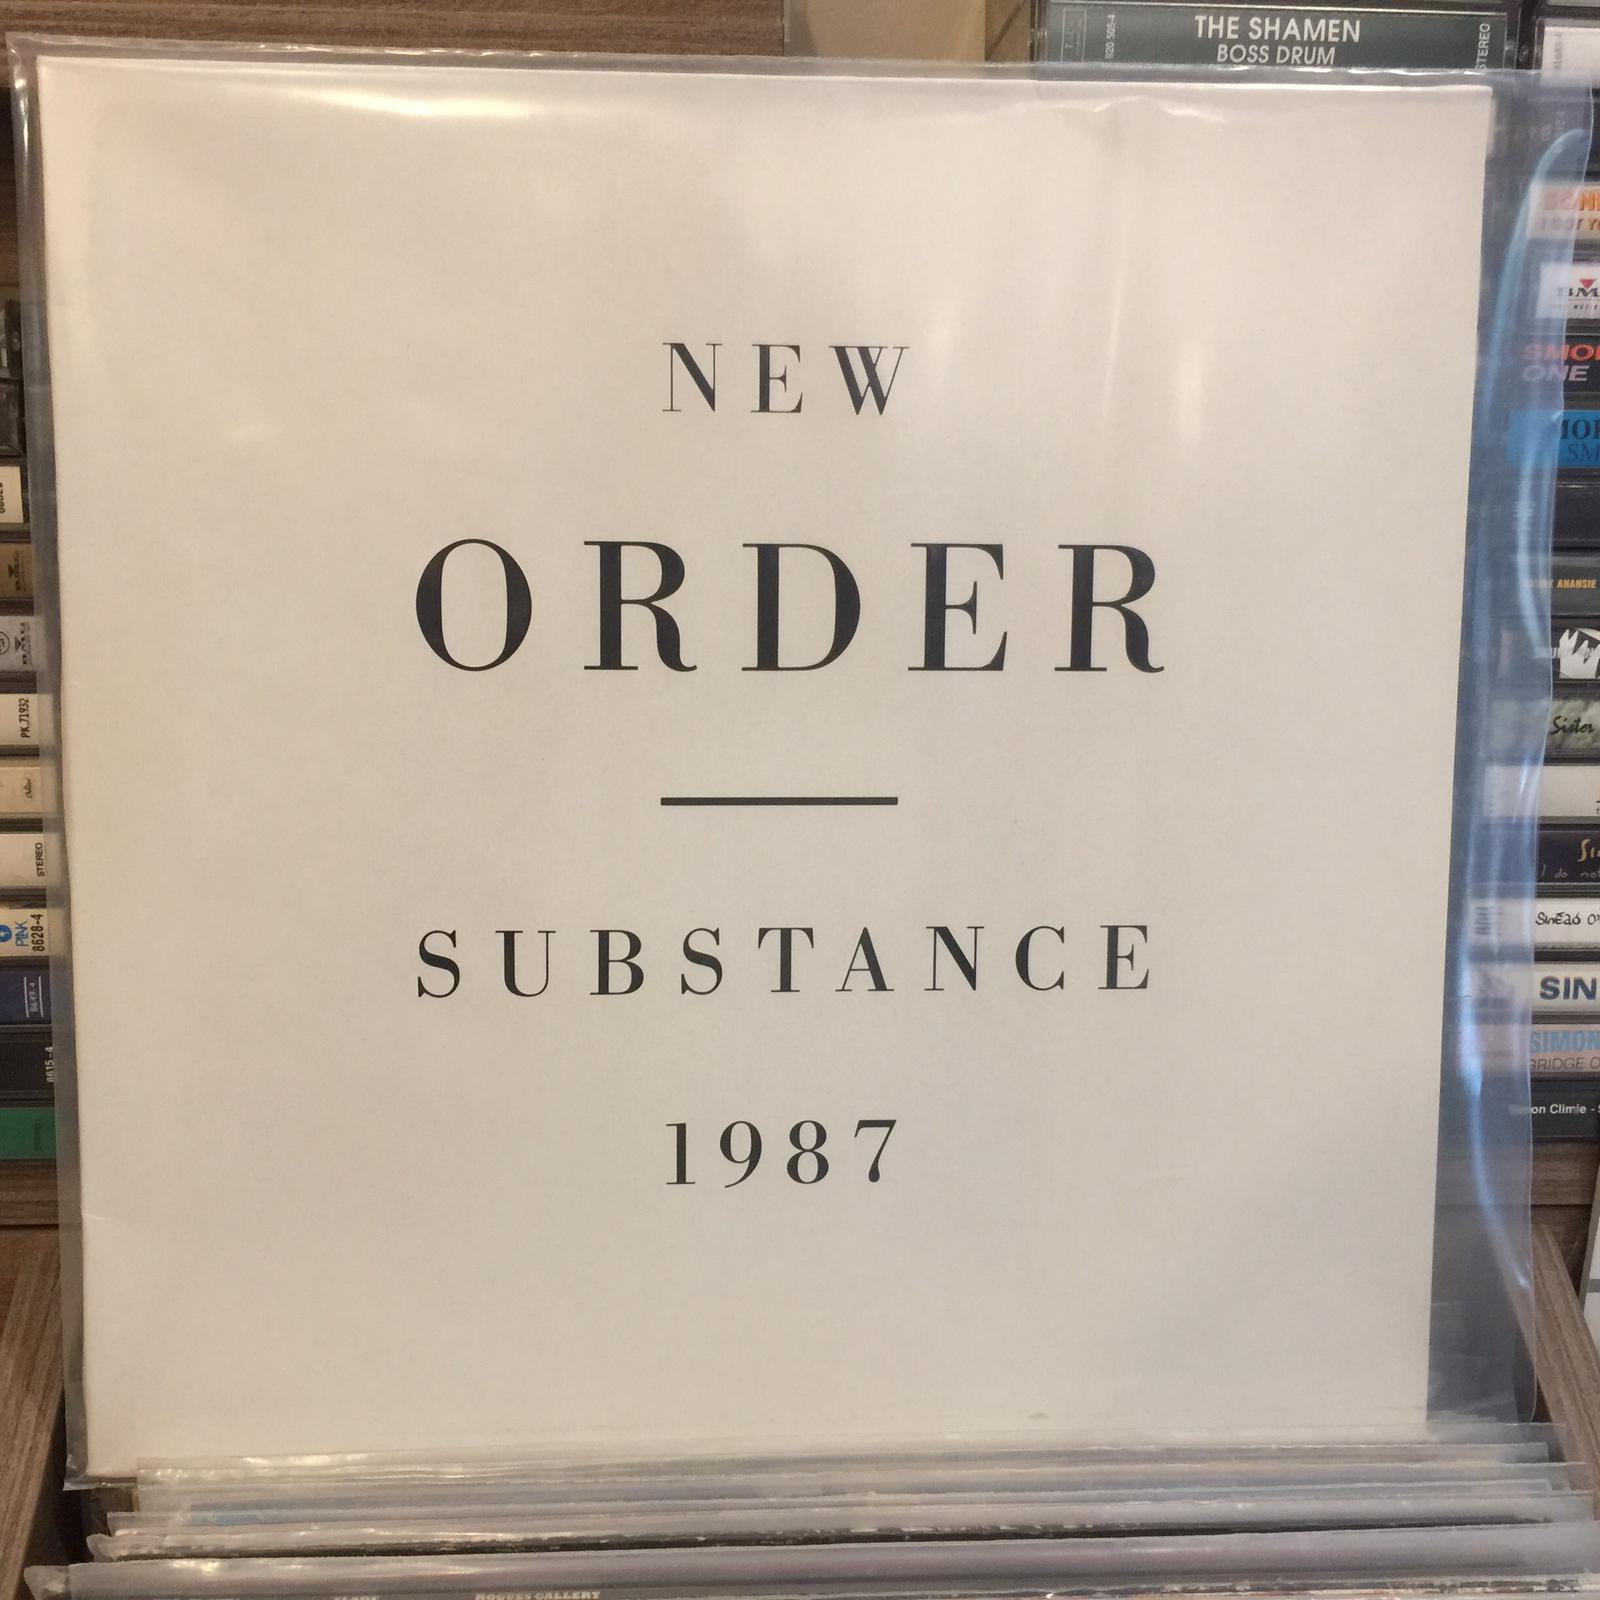 NEW ORDER - SUBSTANCE 1987 LP